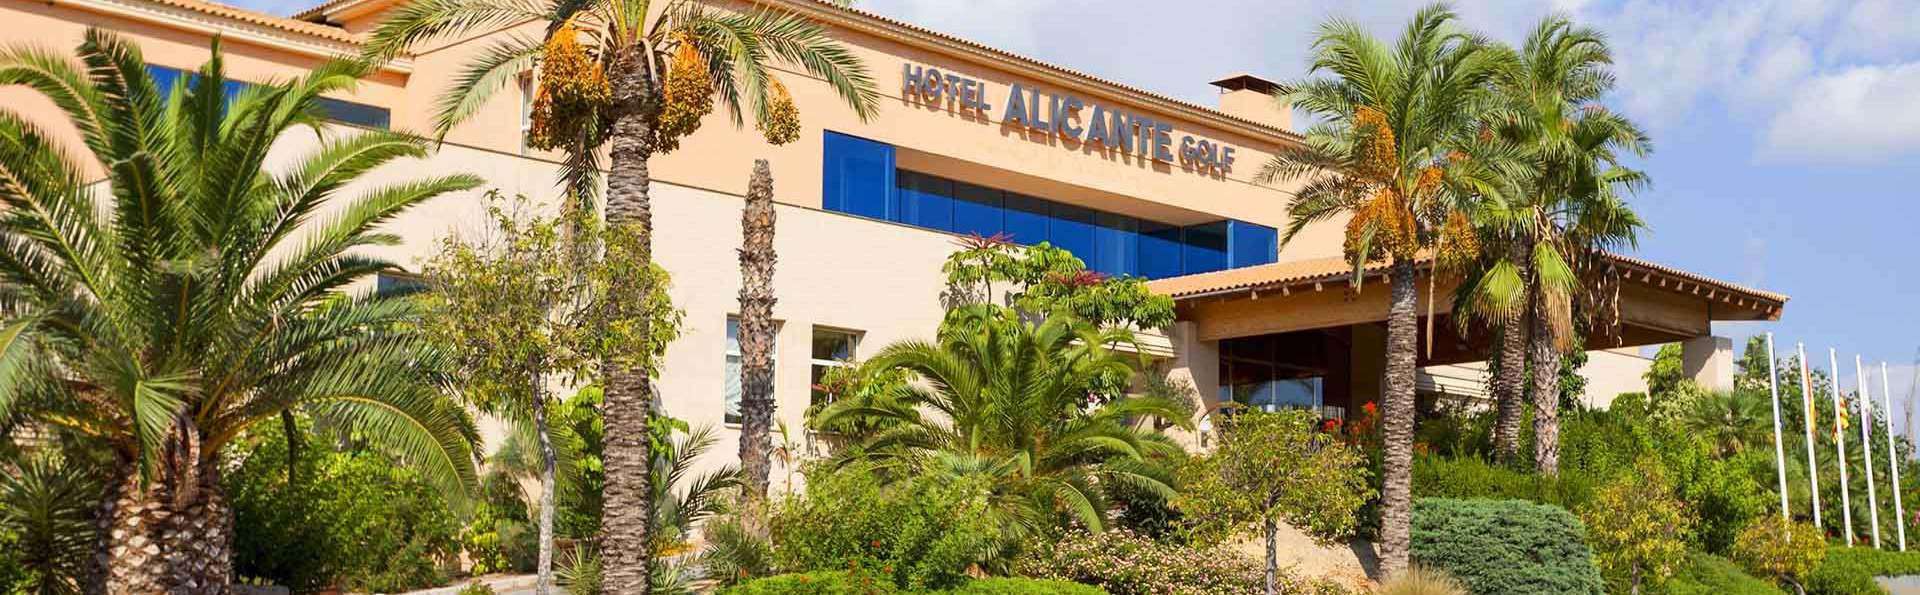 Hotel Alicante Golf & Spa - EDIT_EXTERIOR_04.jpg